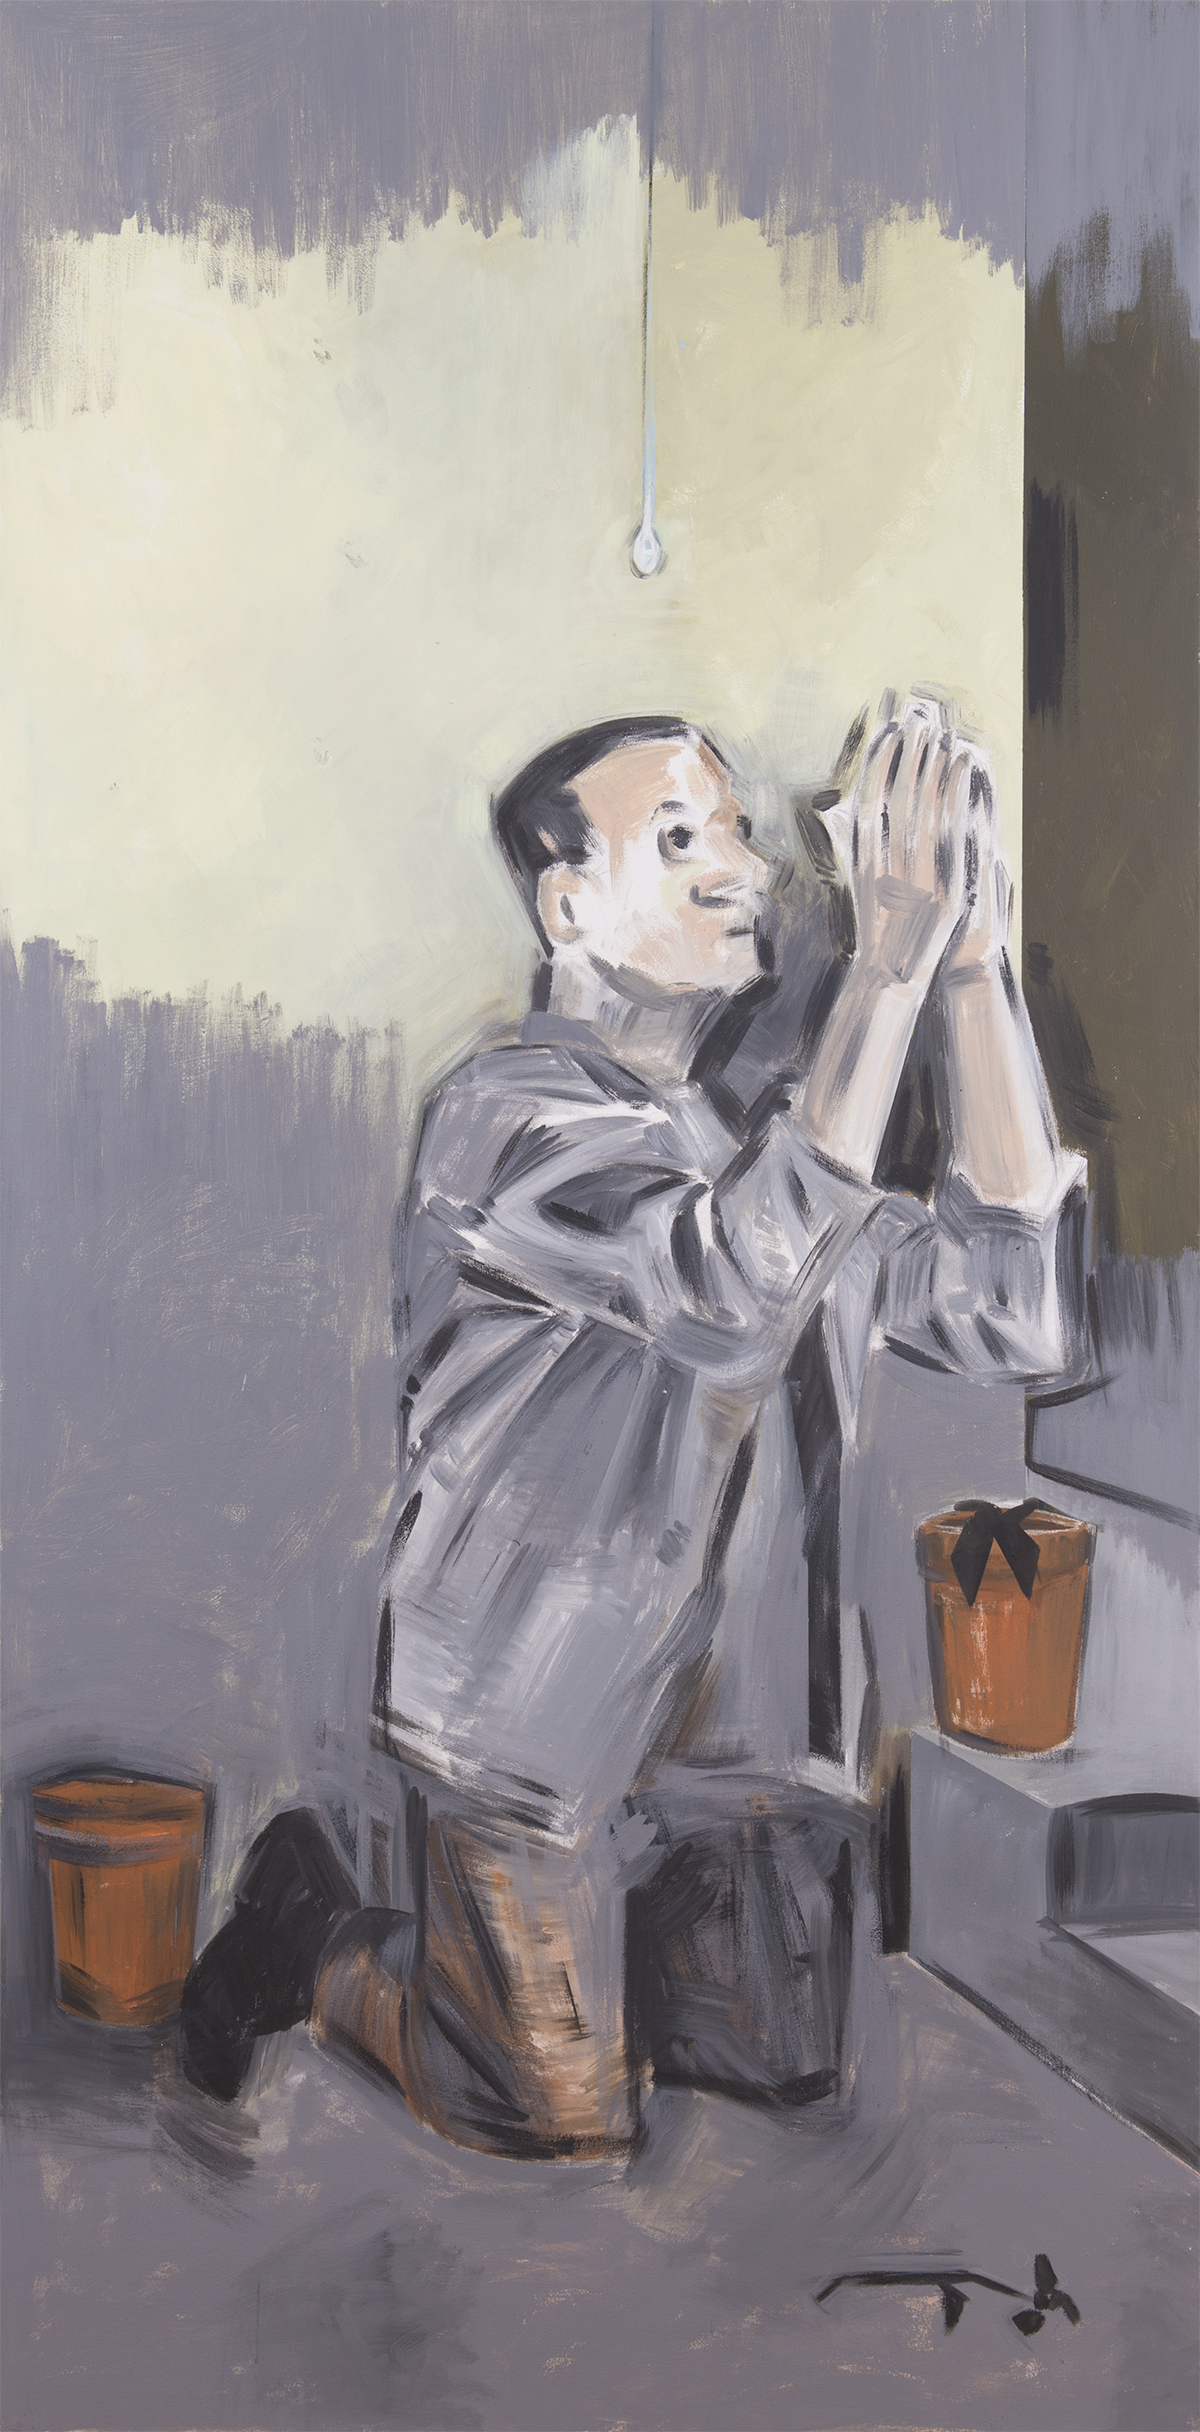 Untitled. Apostolos Georgiou. 2013. Acrylic on canvas. 78.5x 39.25 inches